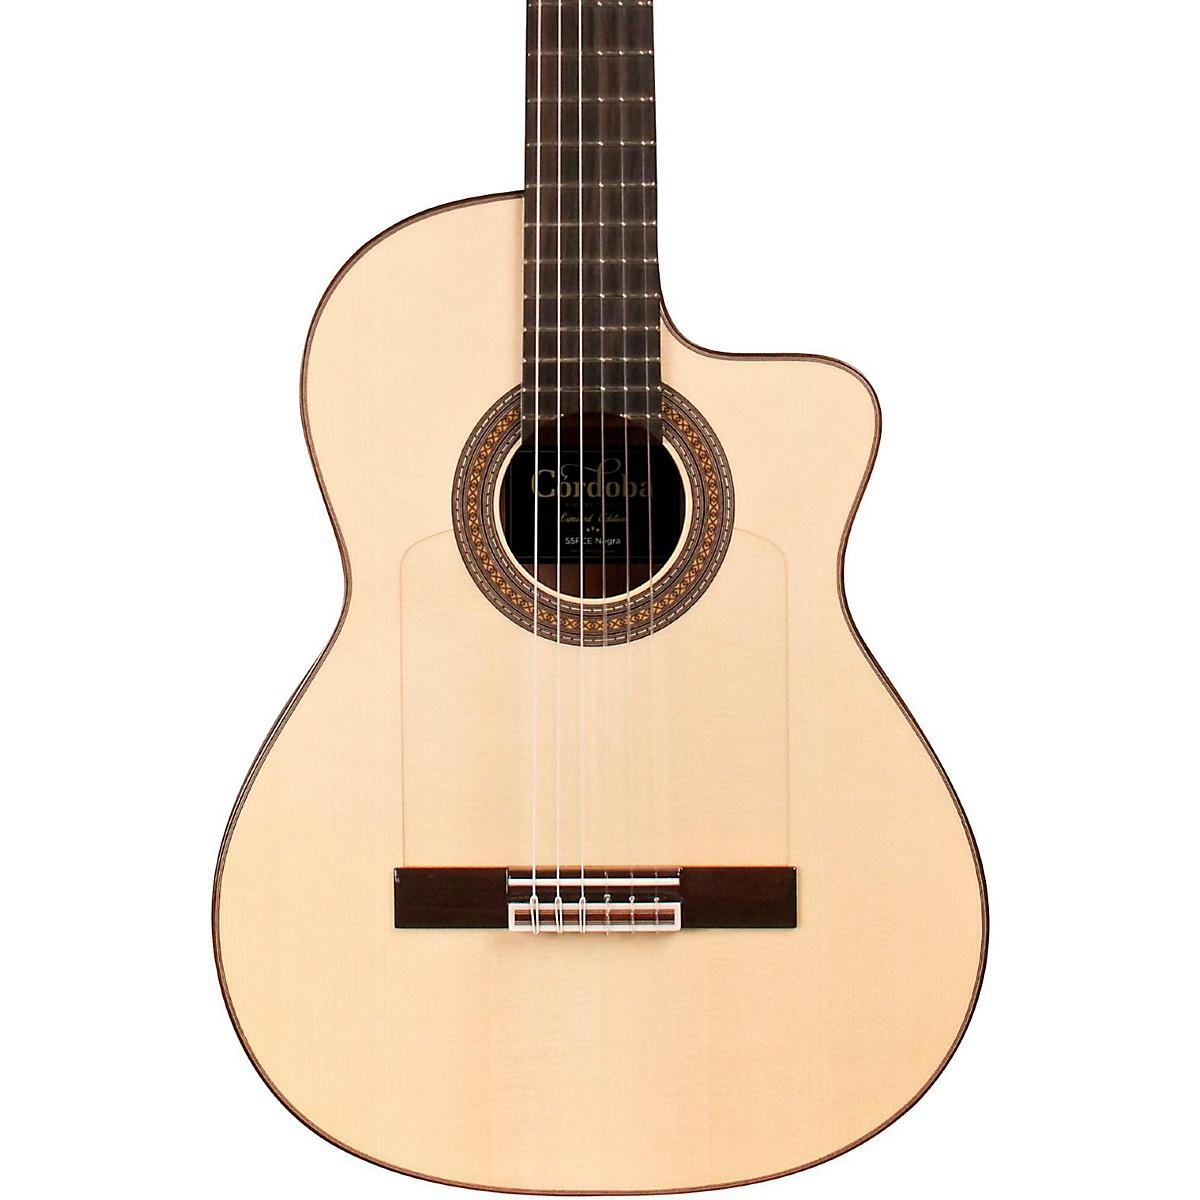 Cordoba 55FCE Thinbody Limited Flamenco Acoustic-Electric Guitar